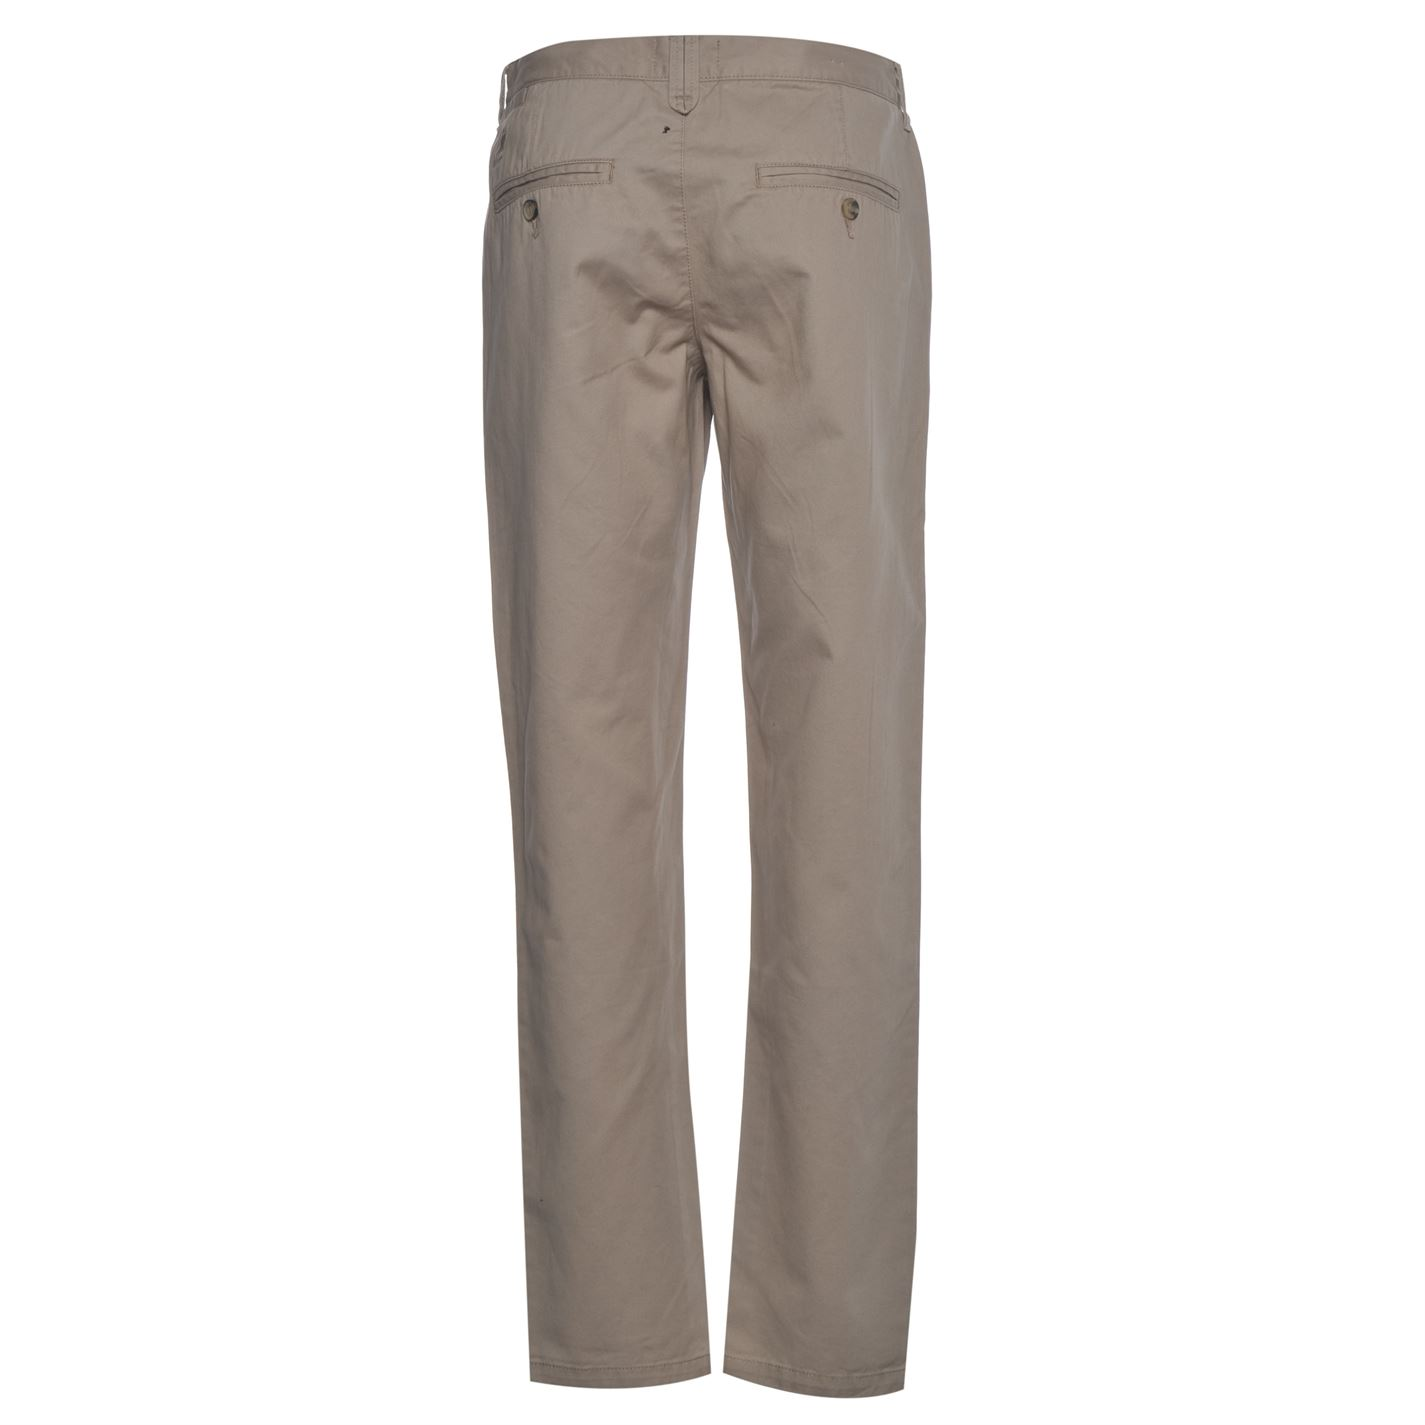 Kangol per Ragazzi Chino Khaki Jeans Kids